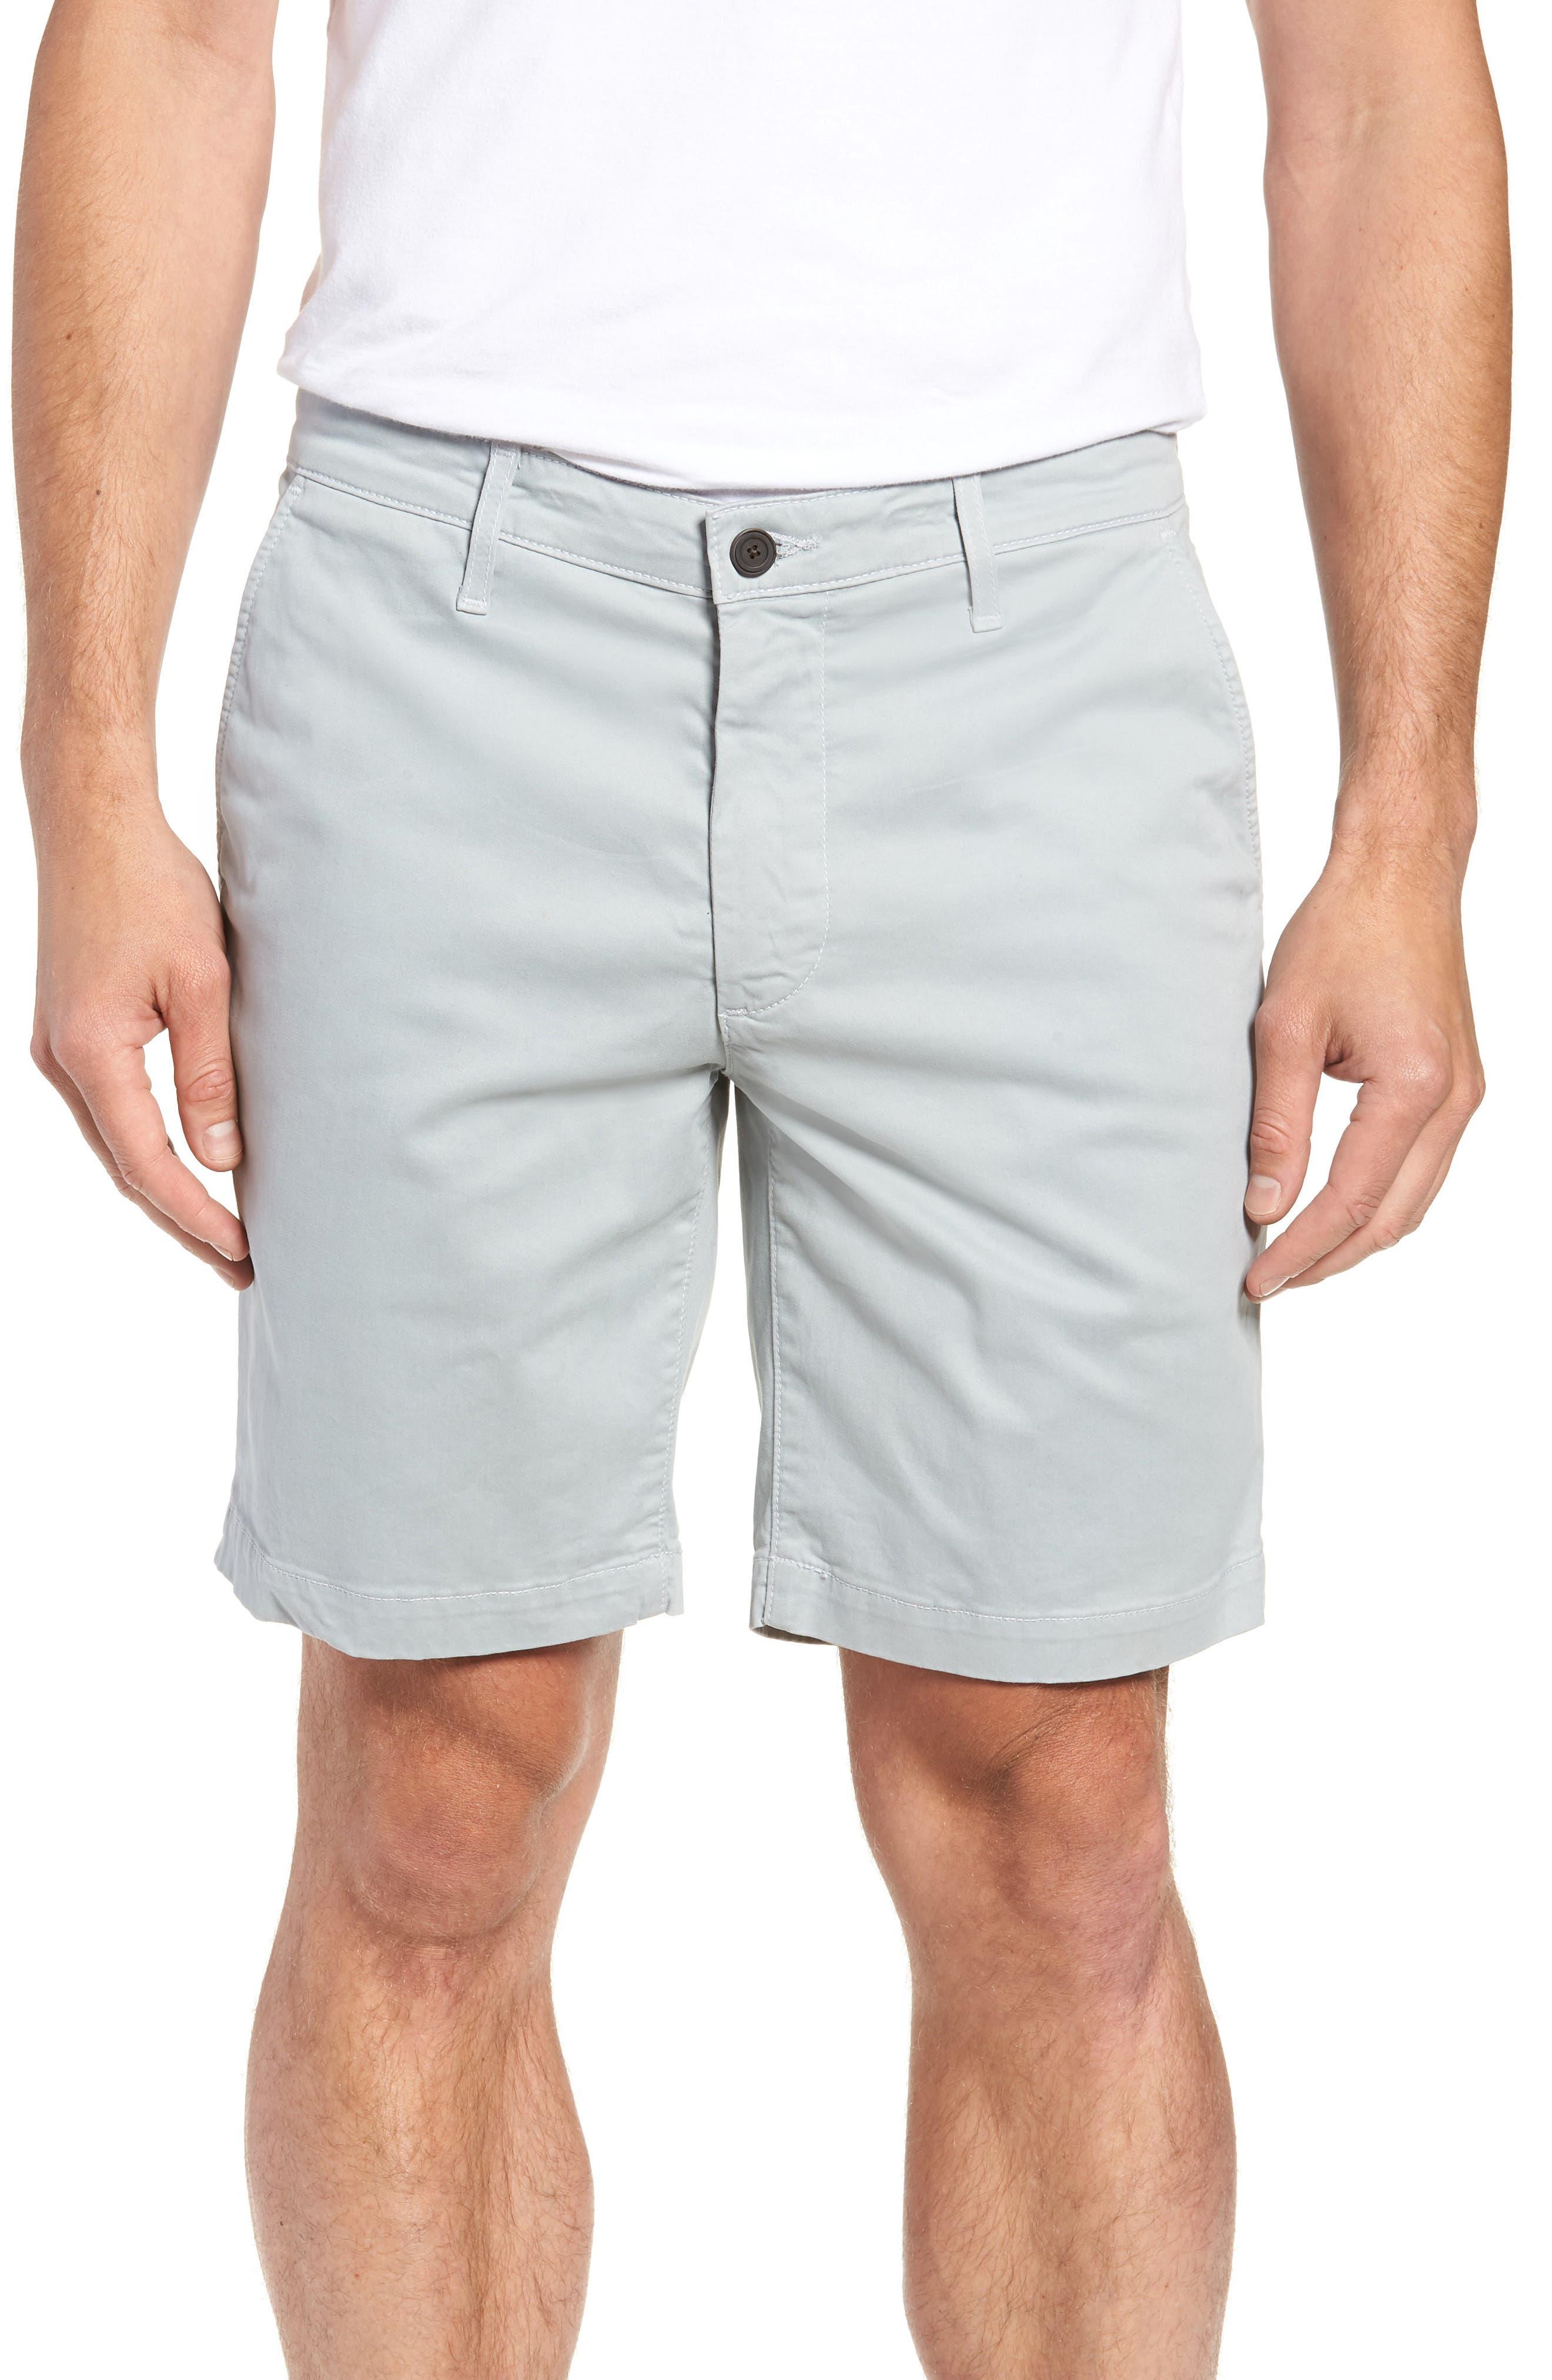 Wanderer Modern Slim Fit Shorts,                             Main thumbnail 1, color,                             MORNING MIST